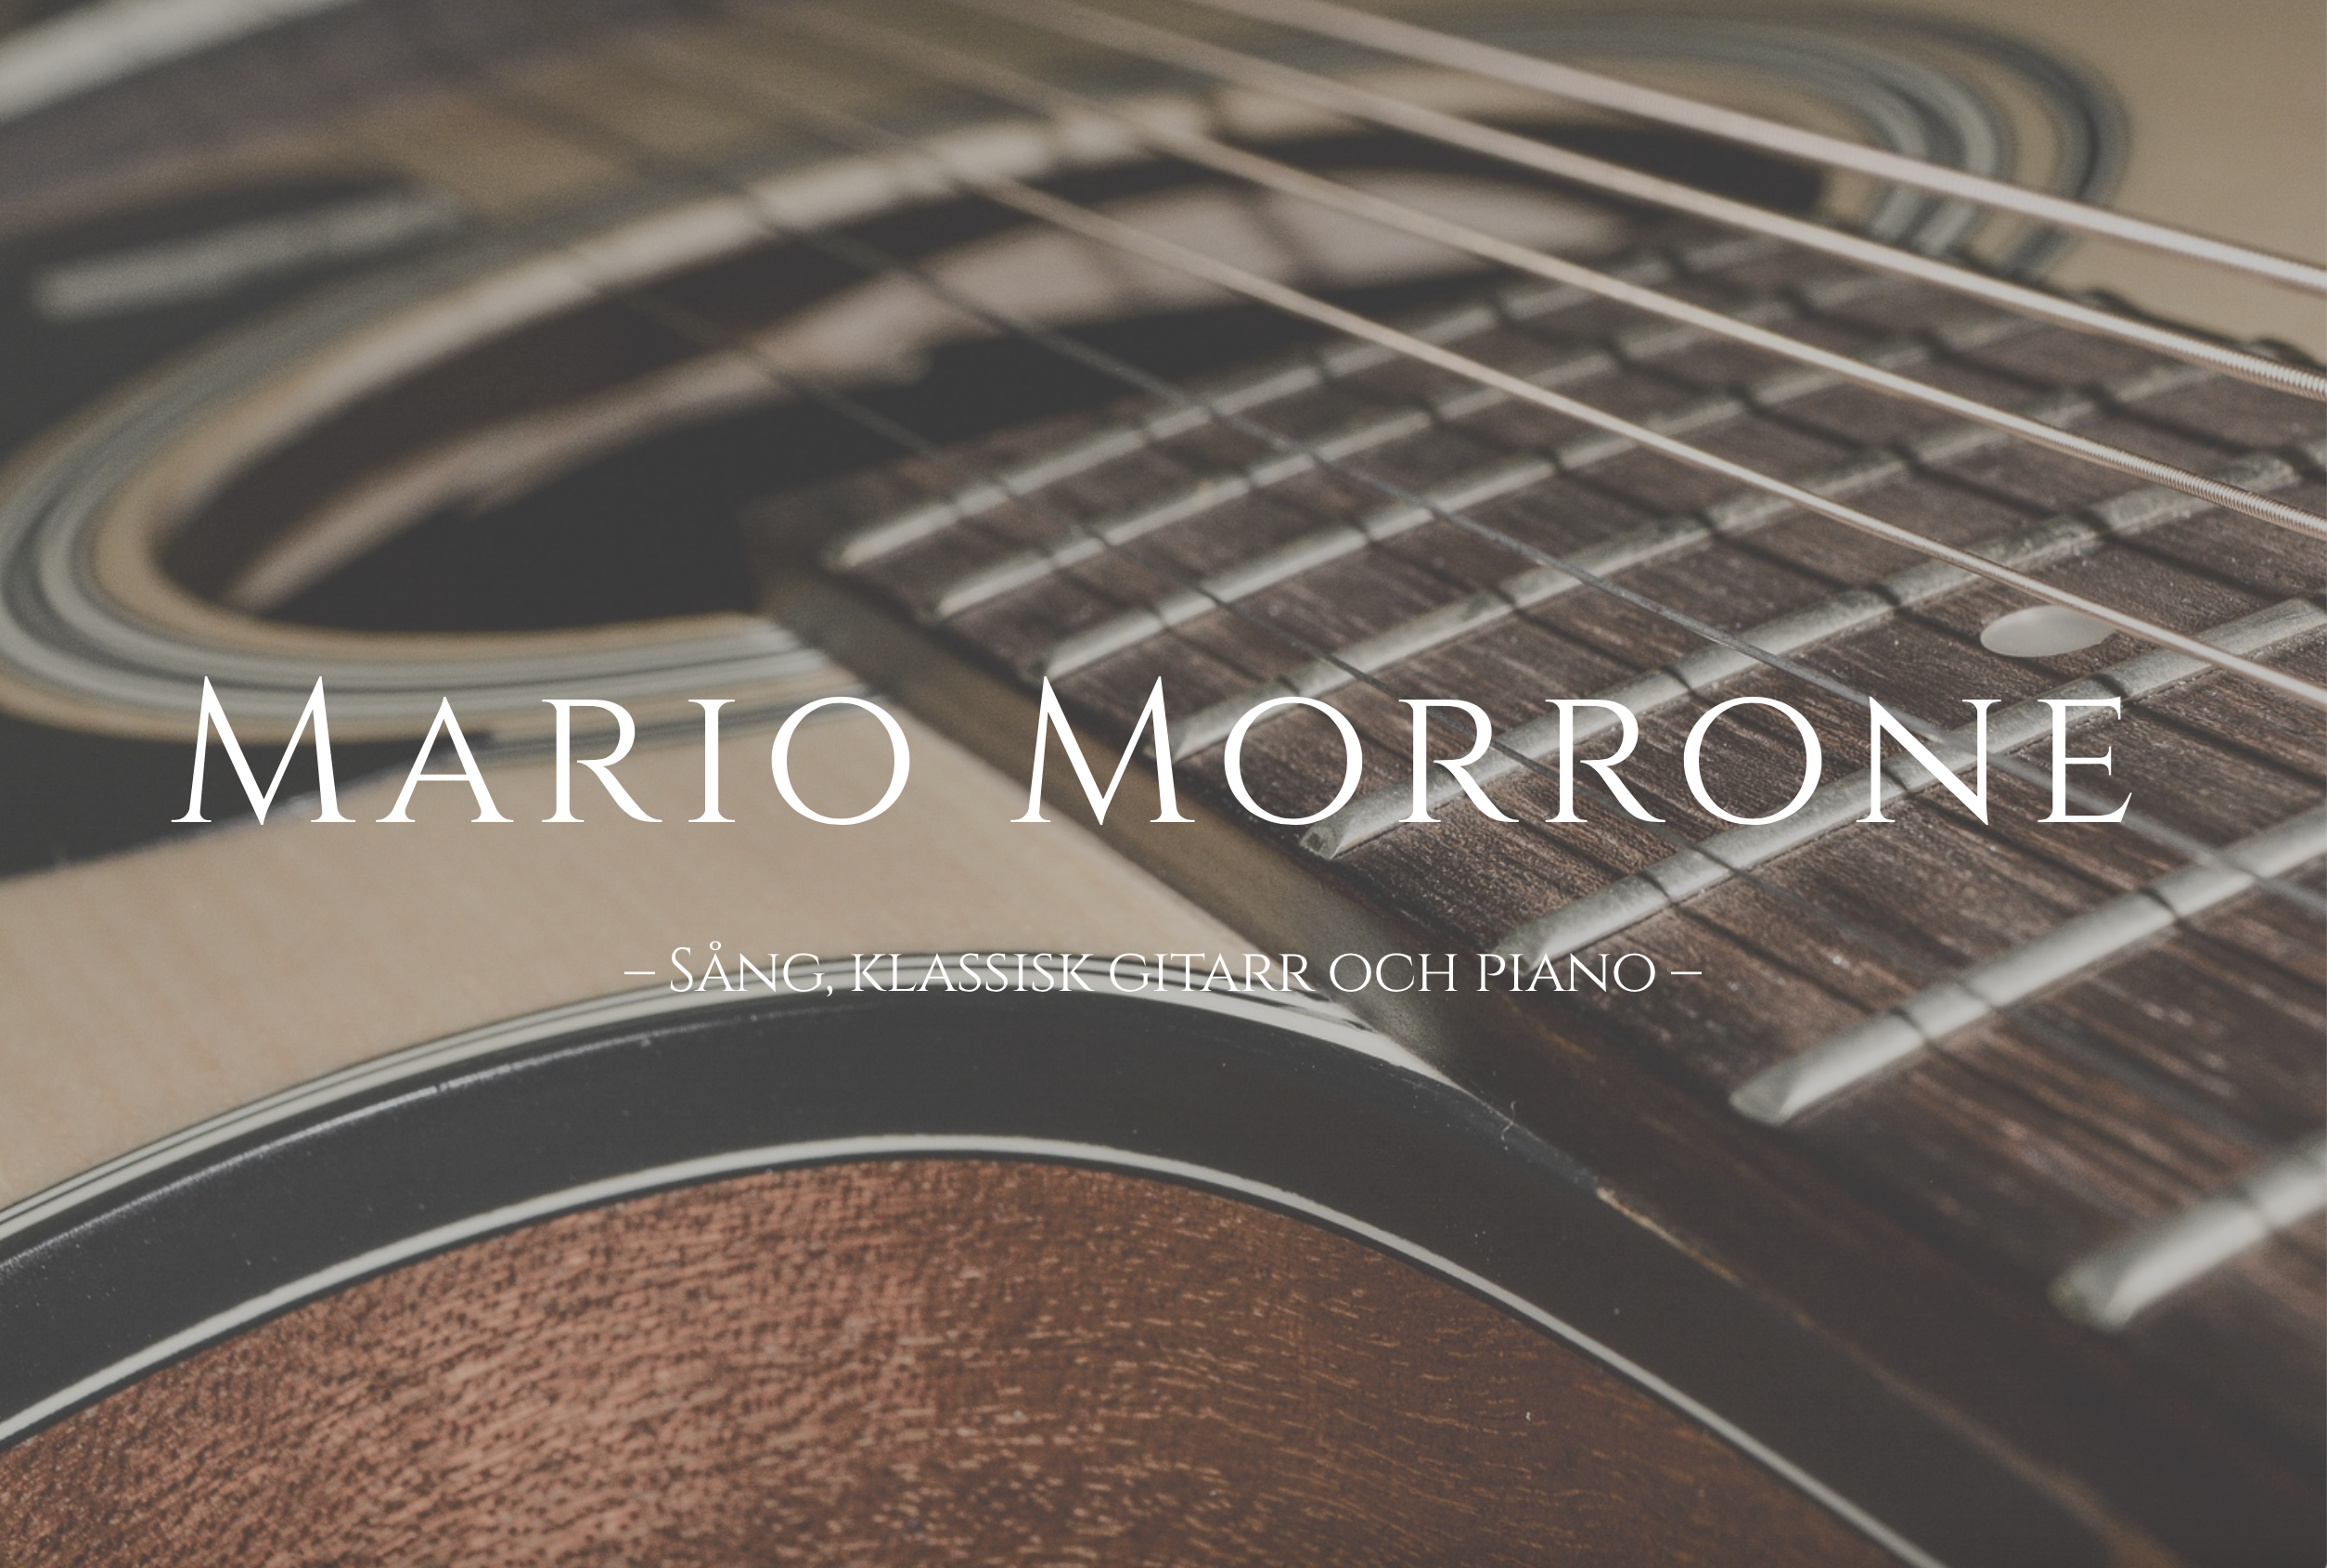 Mario Morrone